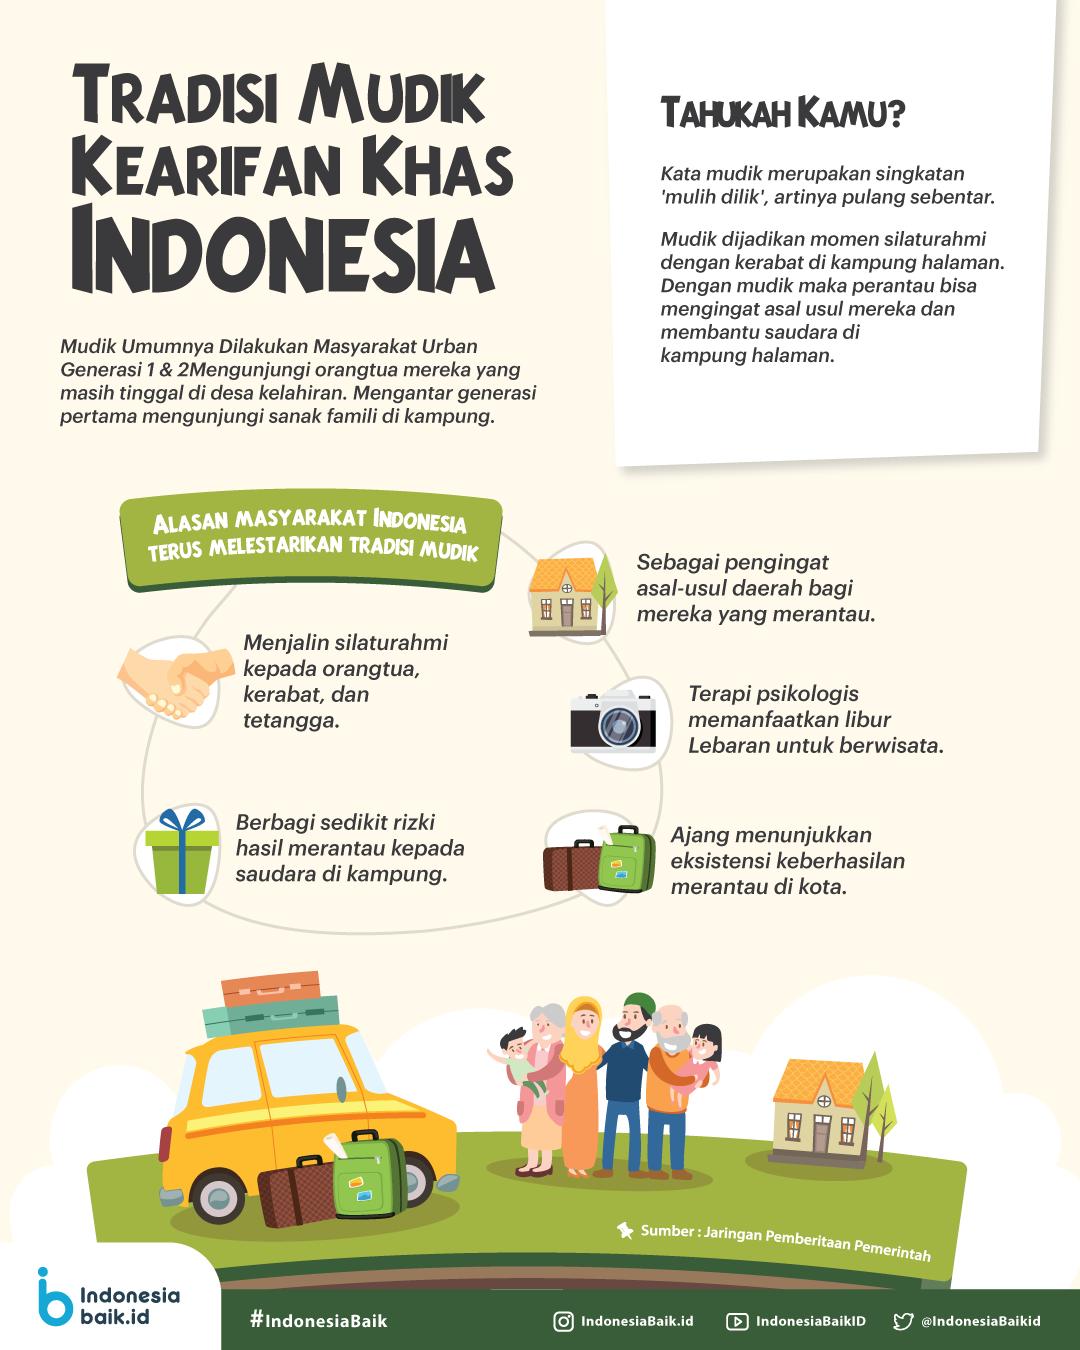 Tradisi Mudik Indonesia